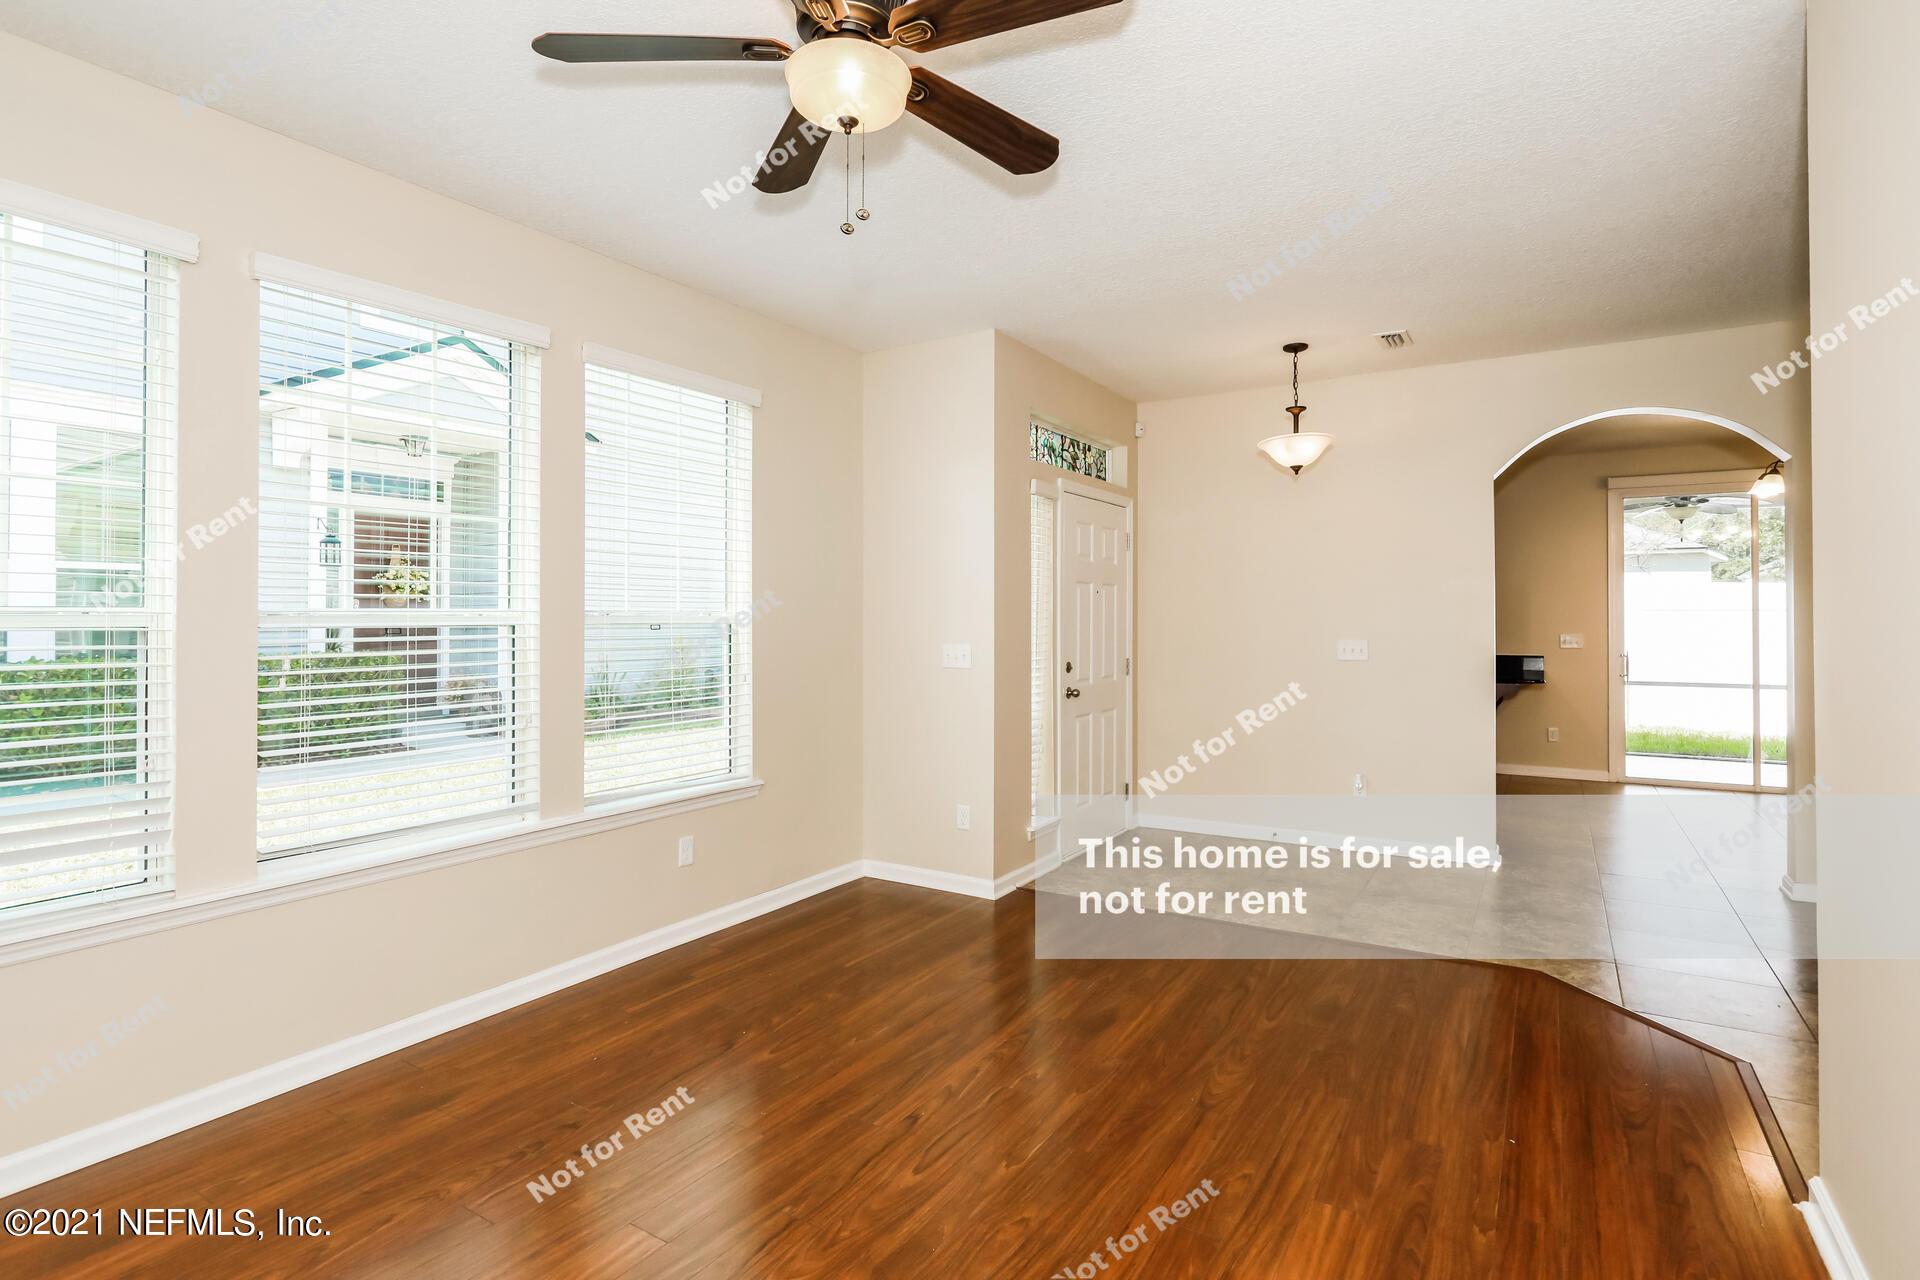 3777 AUBREY, ORANGE PARK, FLORIDA 32065, 3 Bedrooms Bedrooms, ,2 BathroomsBathrooms,Residential,For sale,AUBREY,1134261